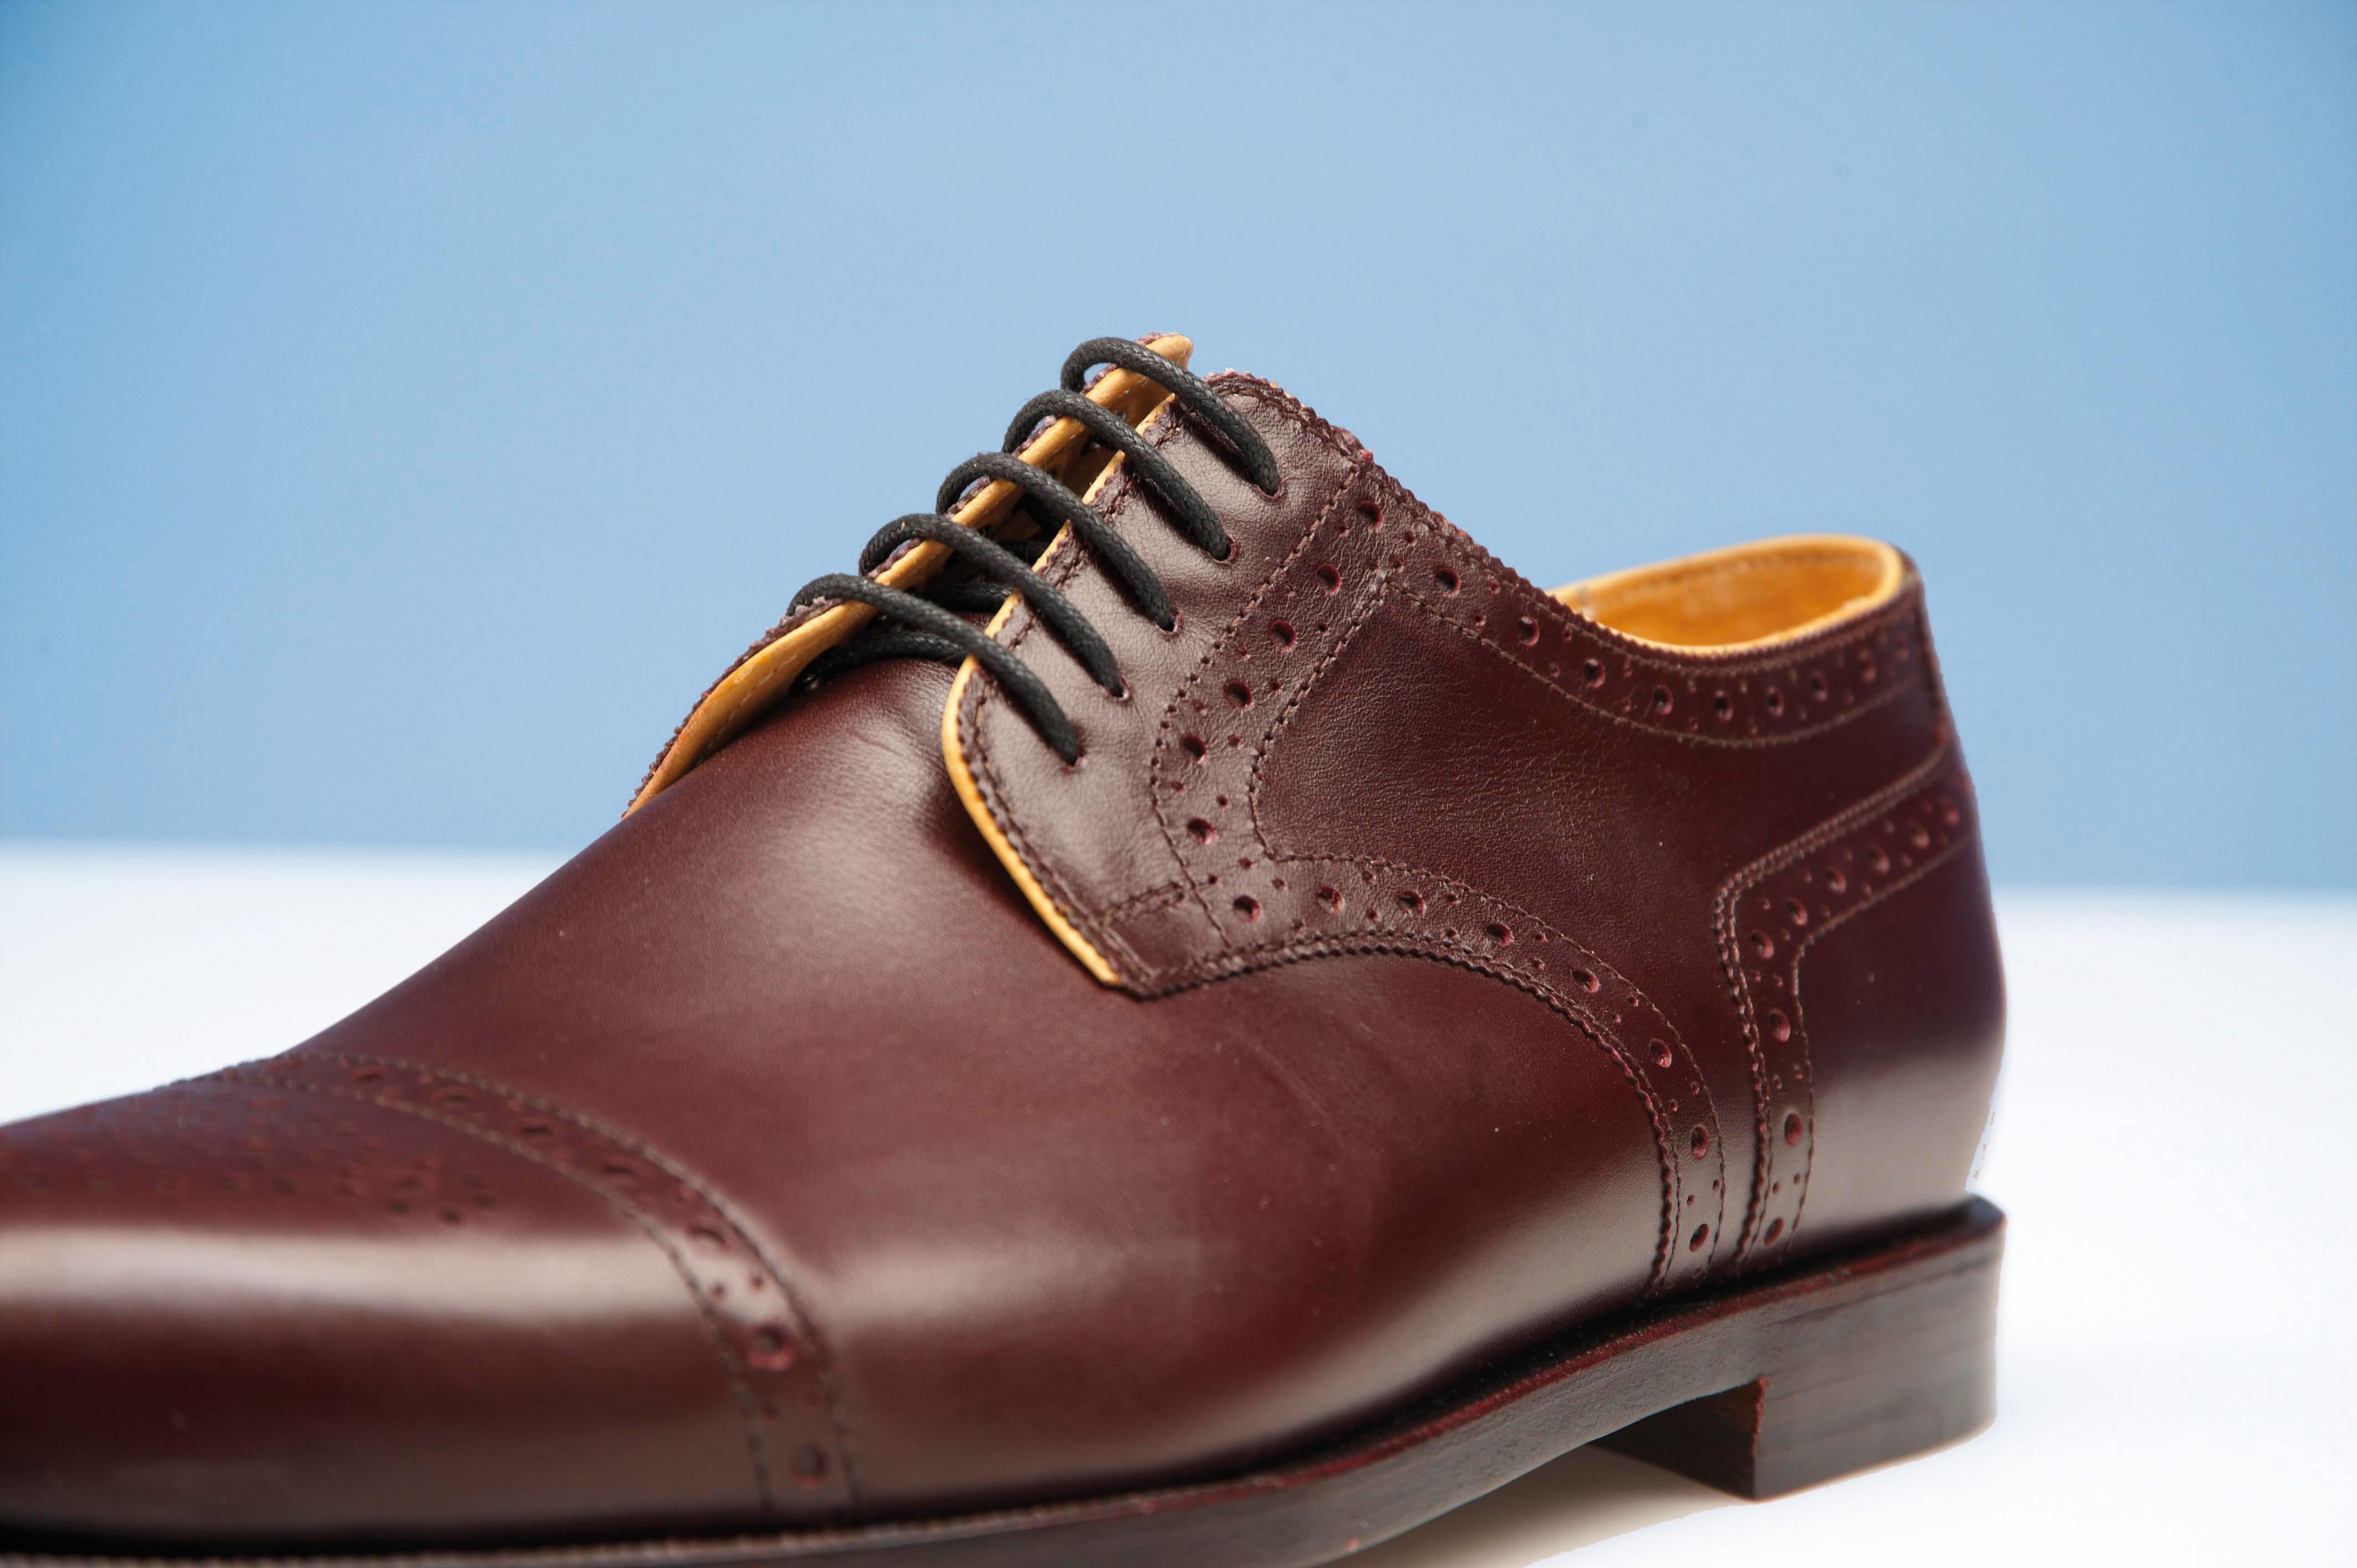 Modell 12 Wiener | Handmacher Schuhe